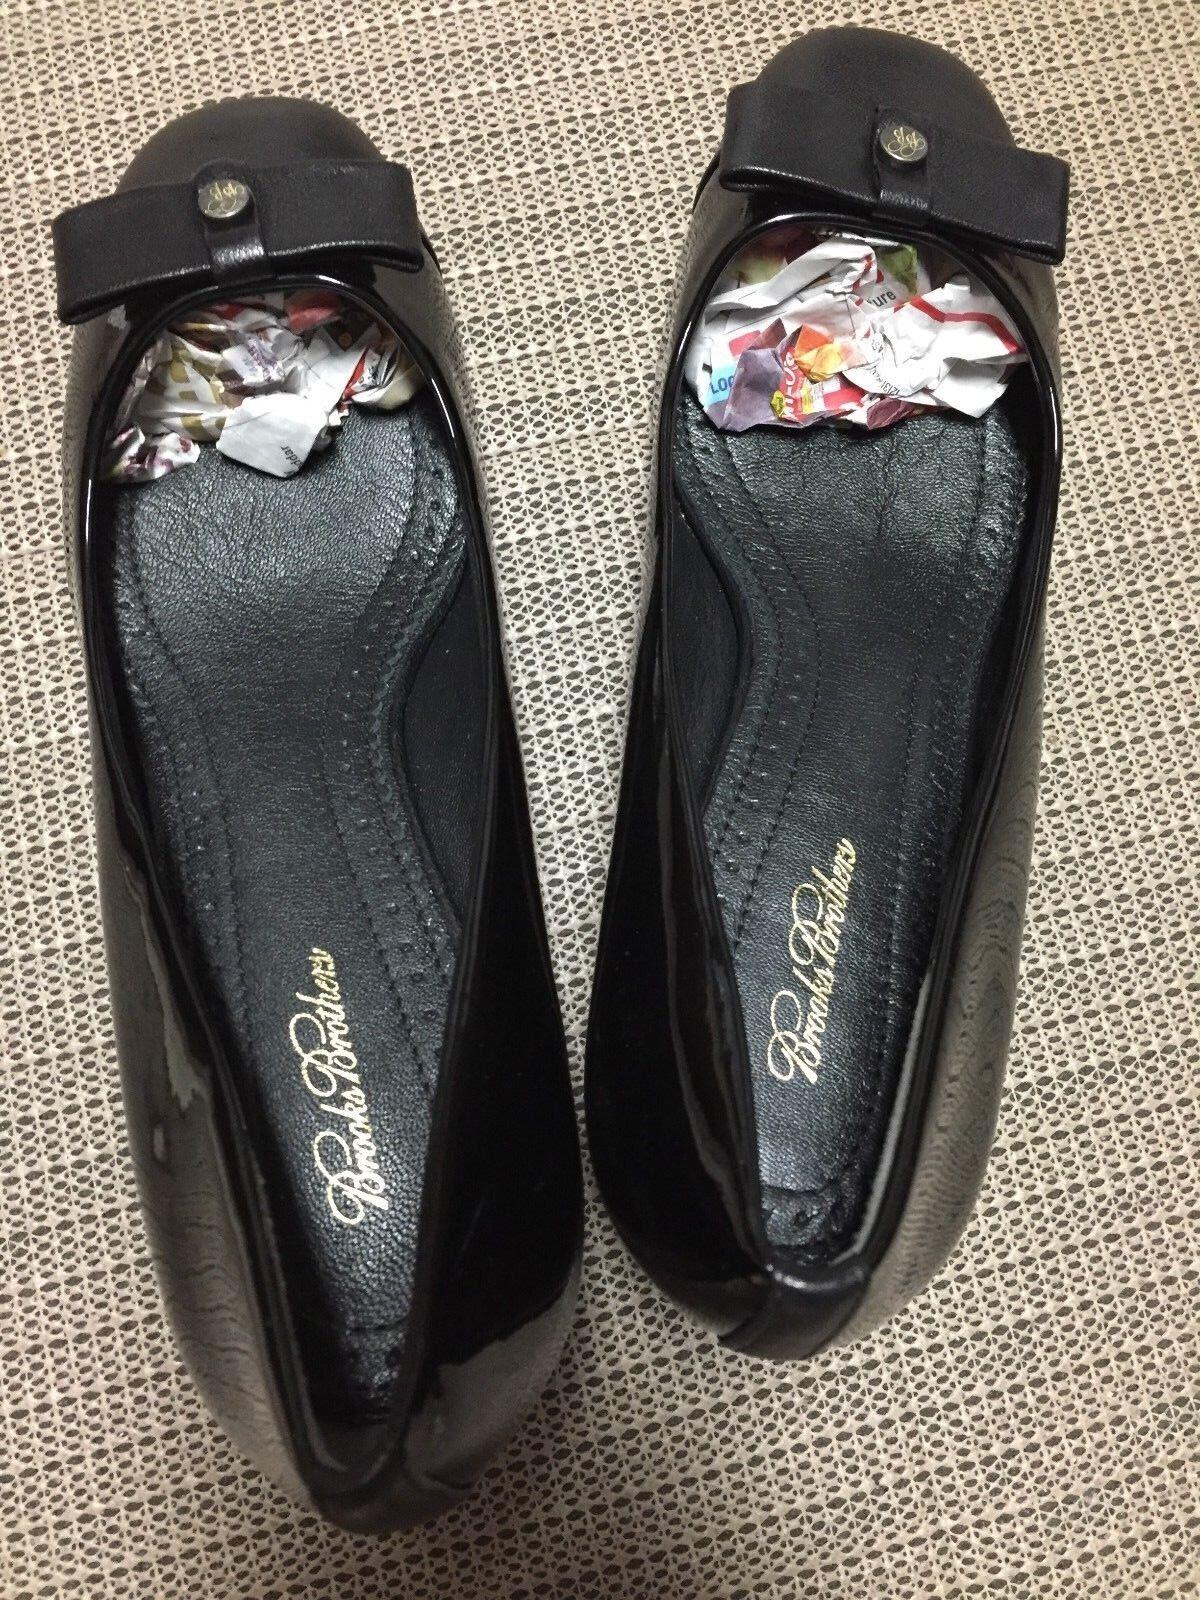 Brooks Brothers Ladies Black Patent Leather High Heel Pumps- Size. 7